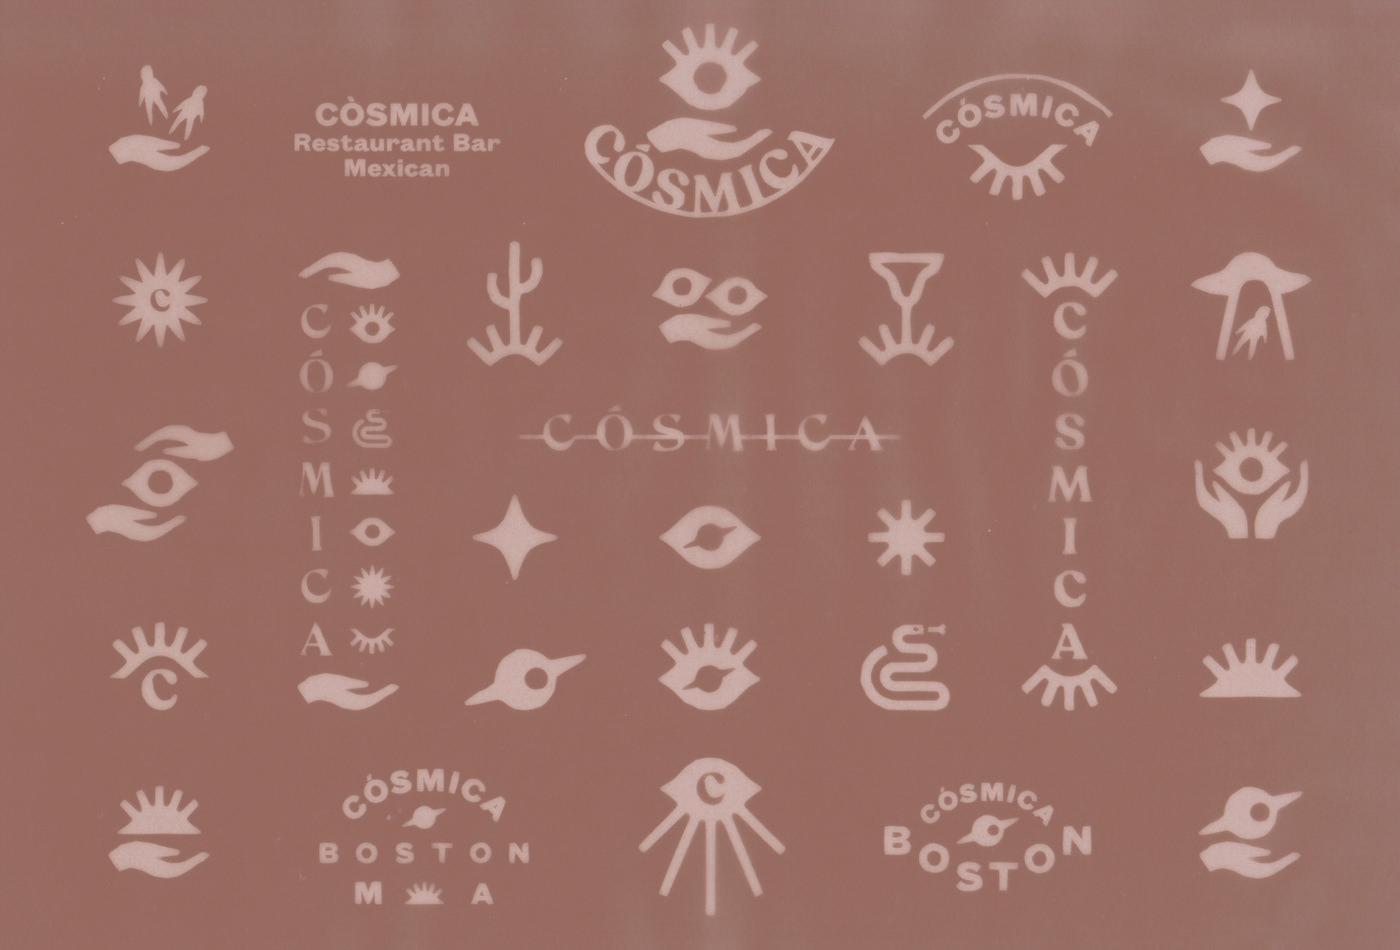 revolutionhotel-cosmica-cosmicaboston-boston-thebeehive-jackbardy-vacaliebres-branding-mexican-mexico-taco-tacos-cla-mex-logo-branding